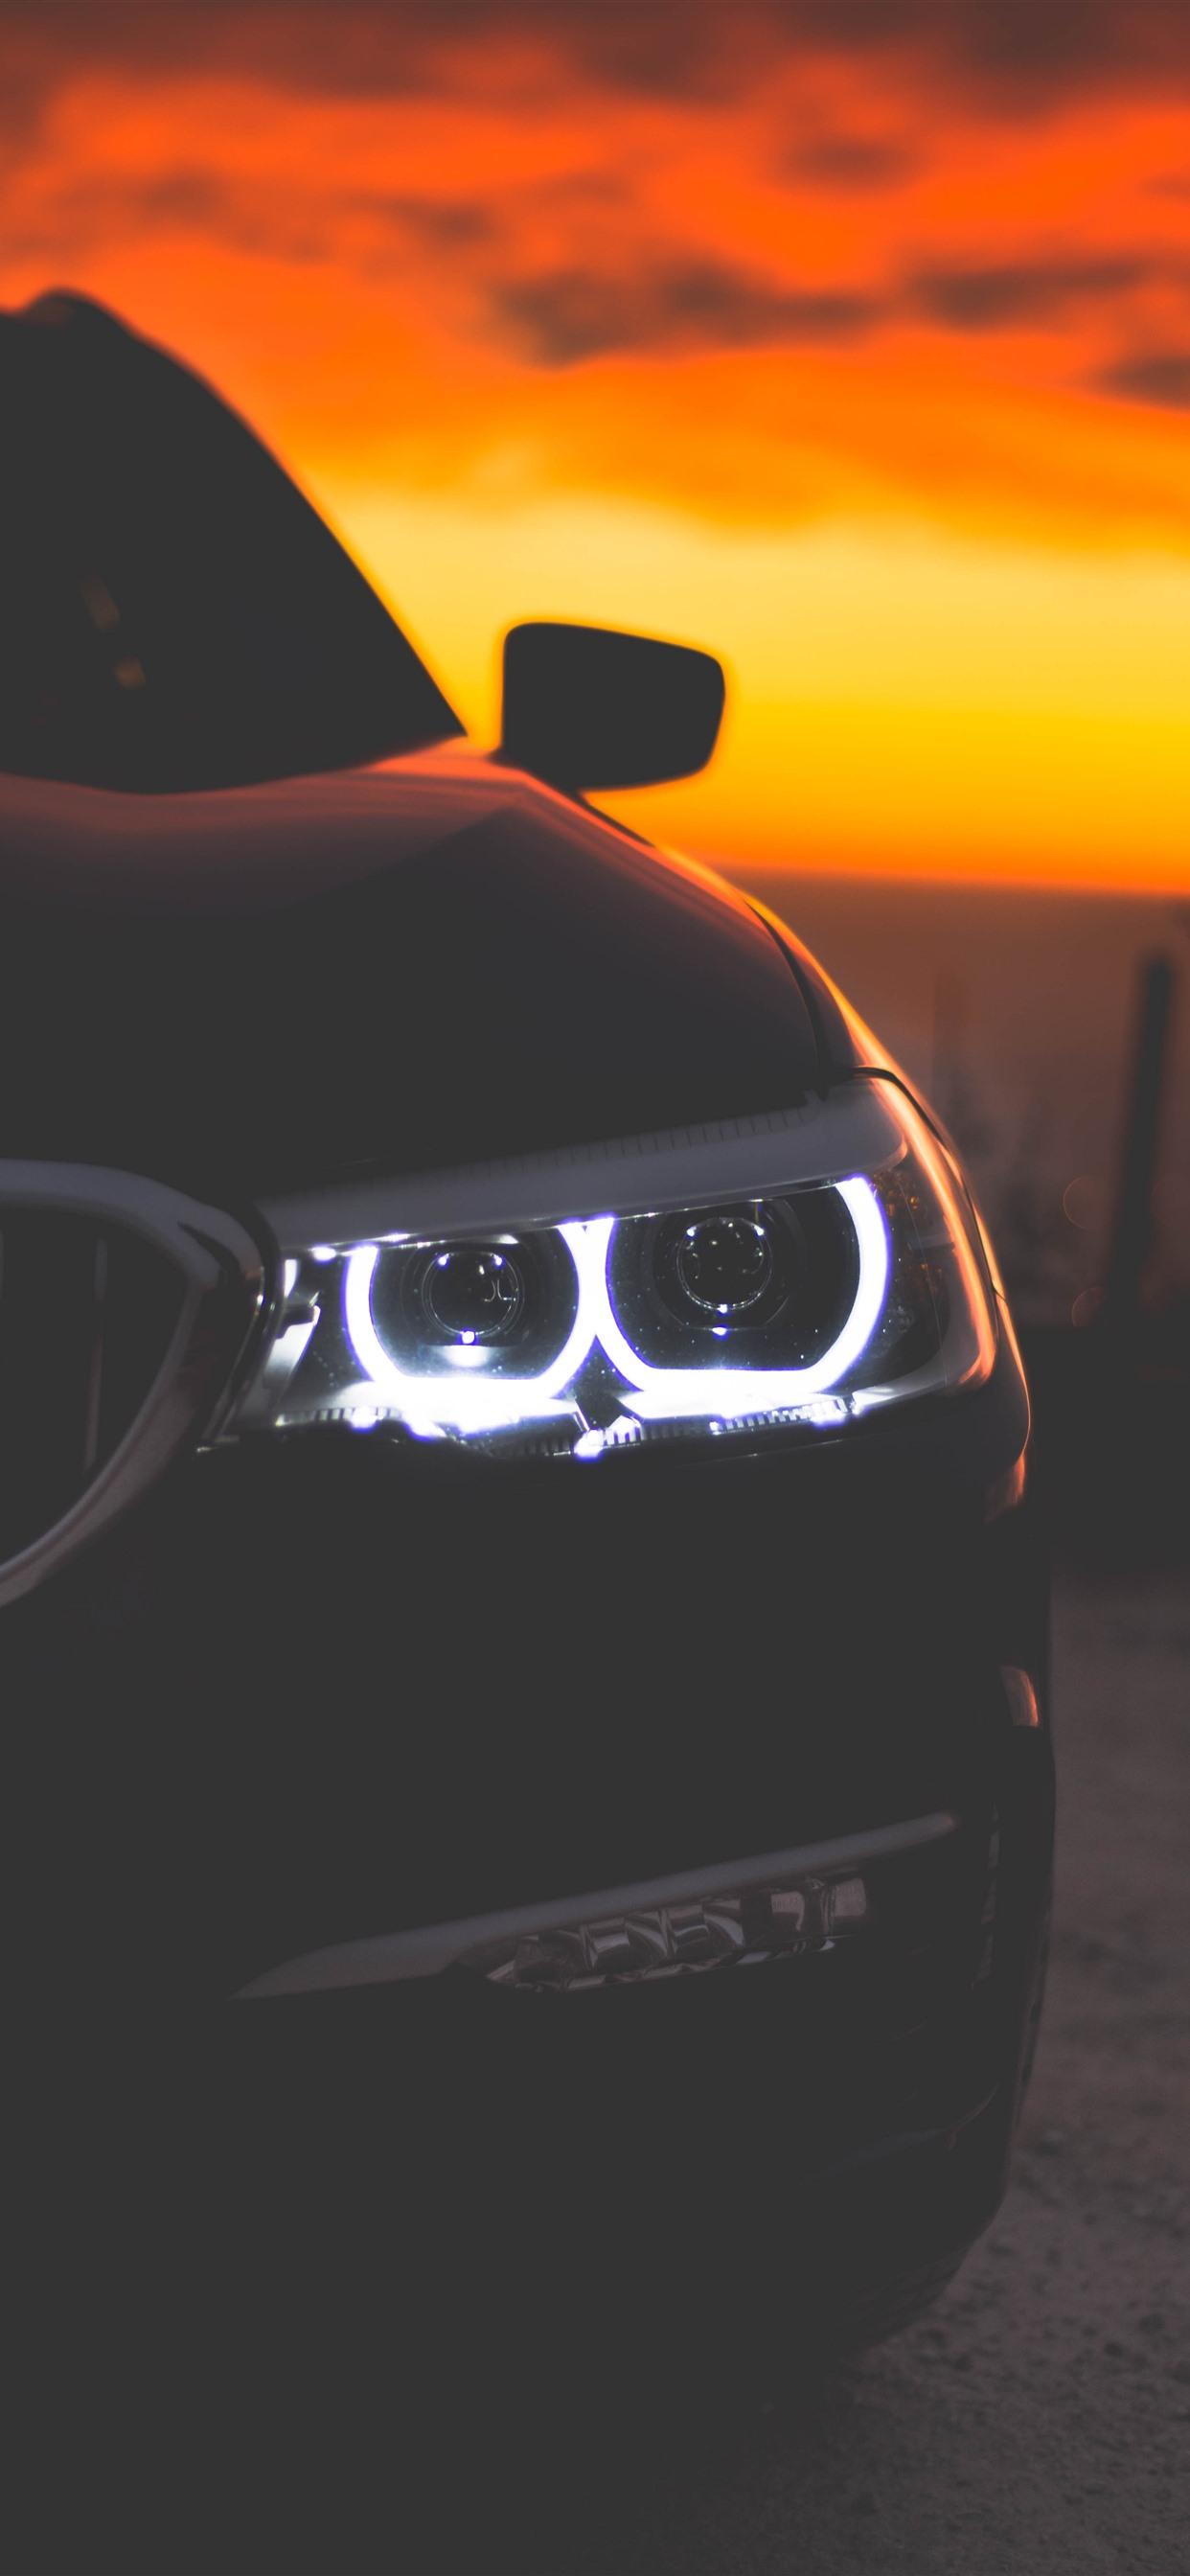 Black Car Front View Headlight Dusk 1242x2688 Iphone Xs Max